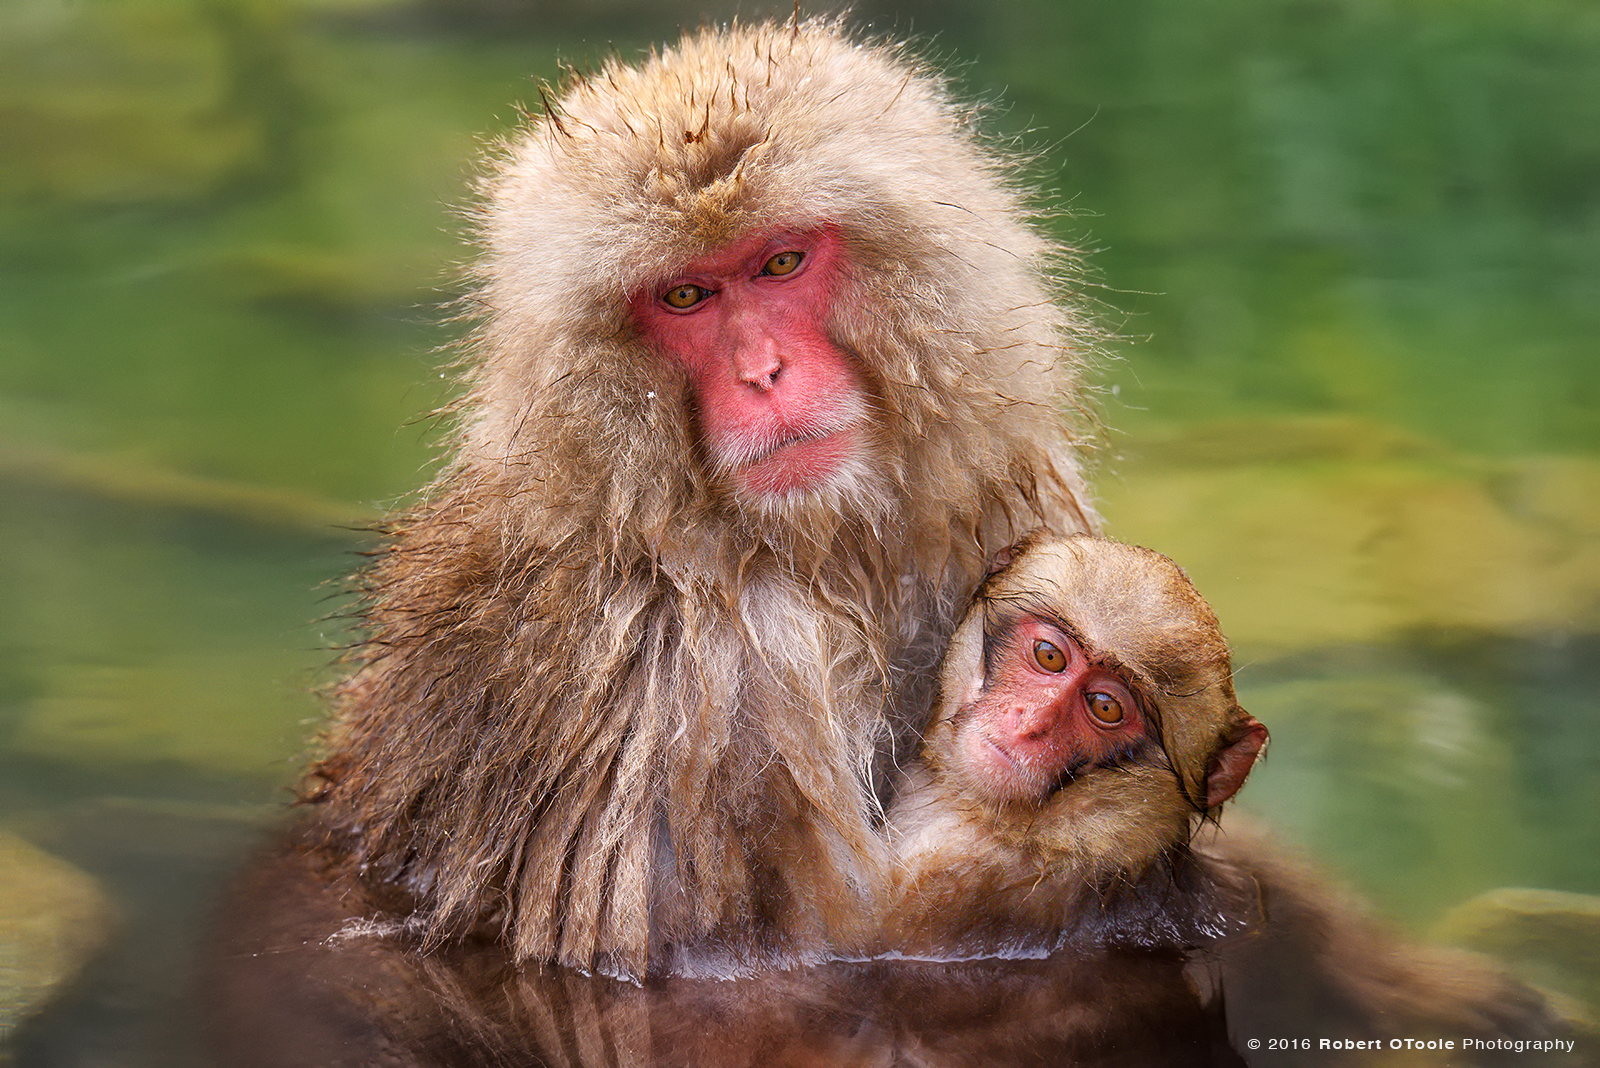 Snow Monkey Pair Enjoying the Hot Green Spring